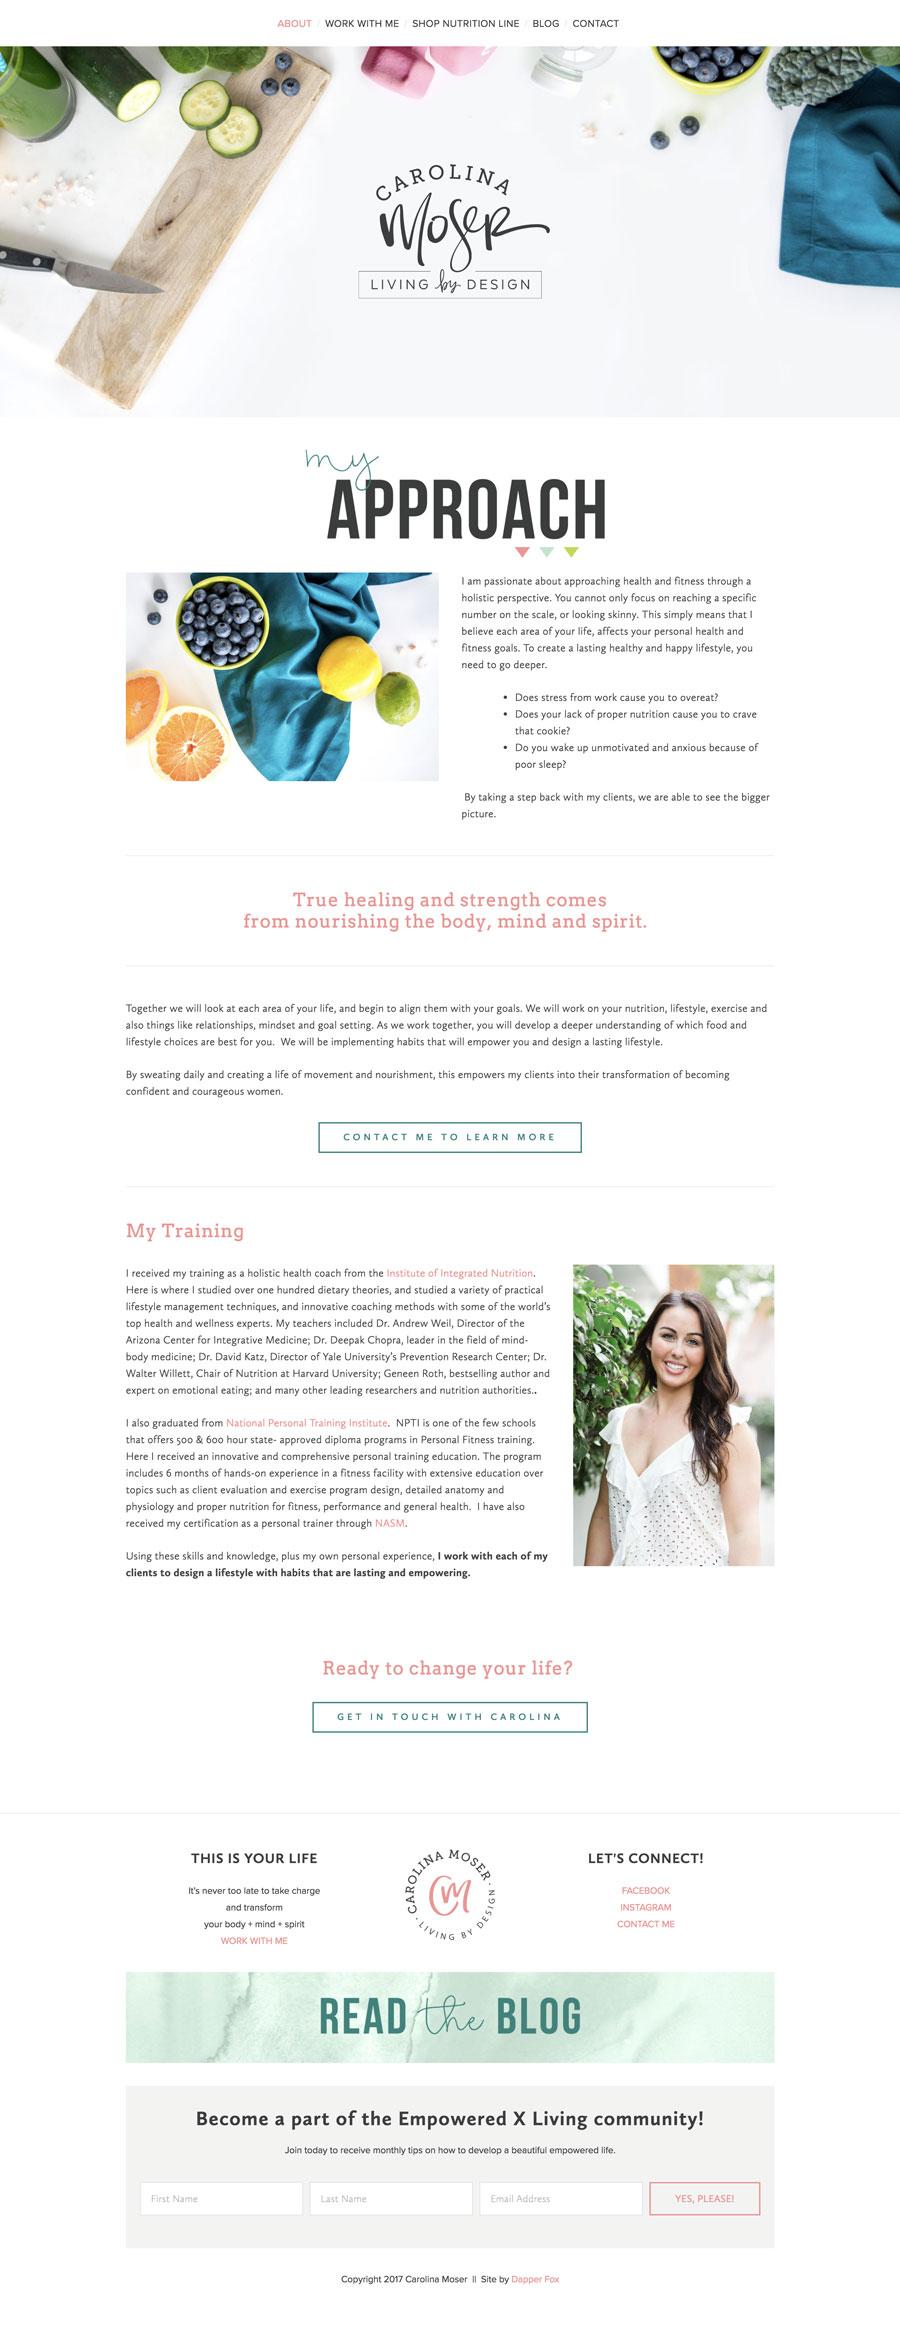 Website Design for Nutritionist, Health Coach and Fitness Website Utah Squarespace Website Design and Branding by Dapper Fox Design